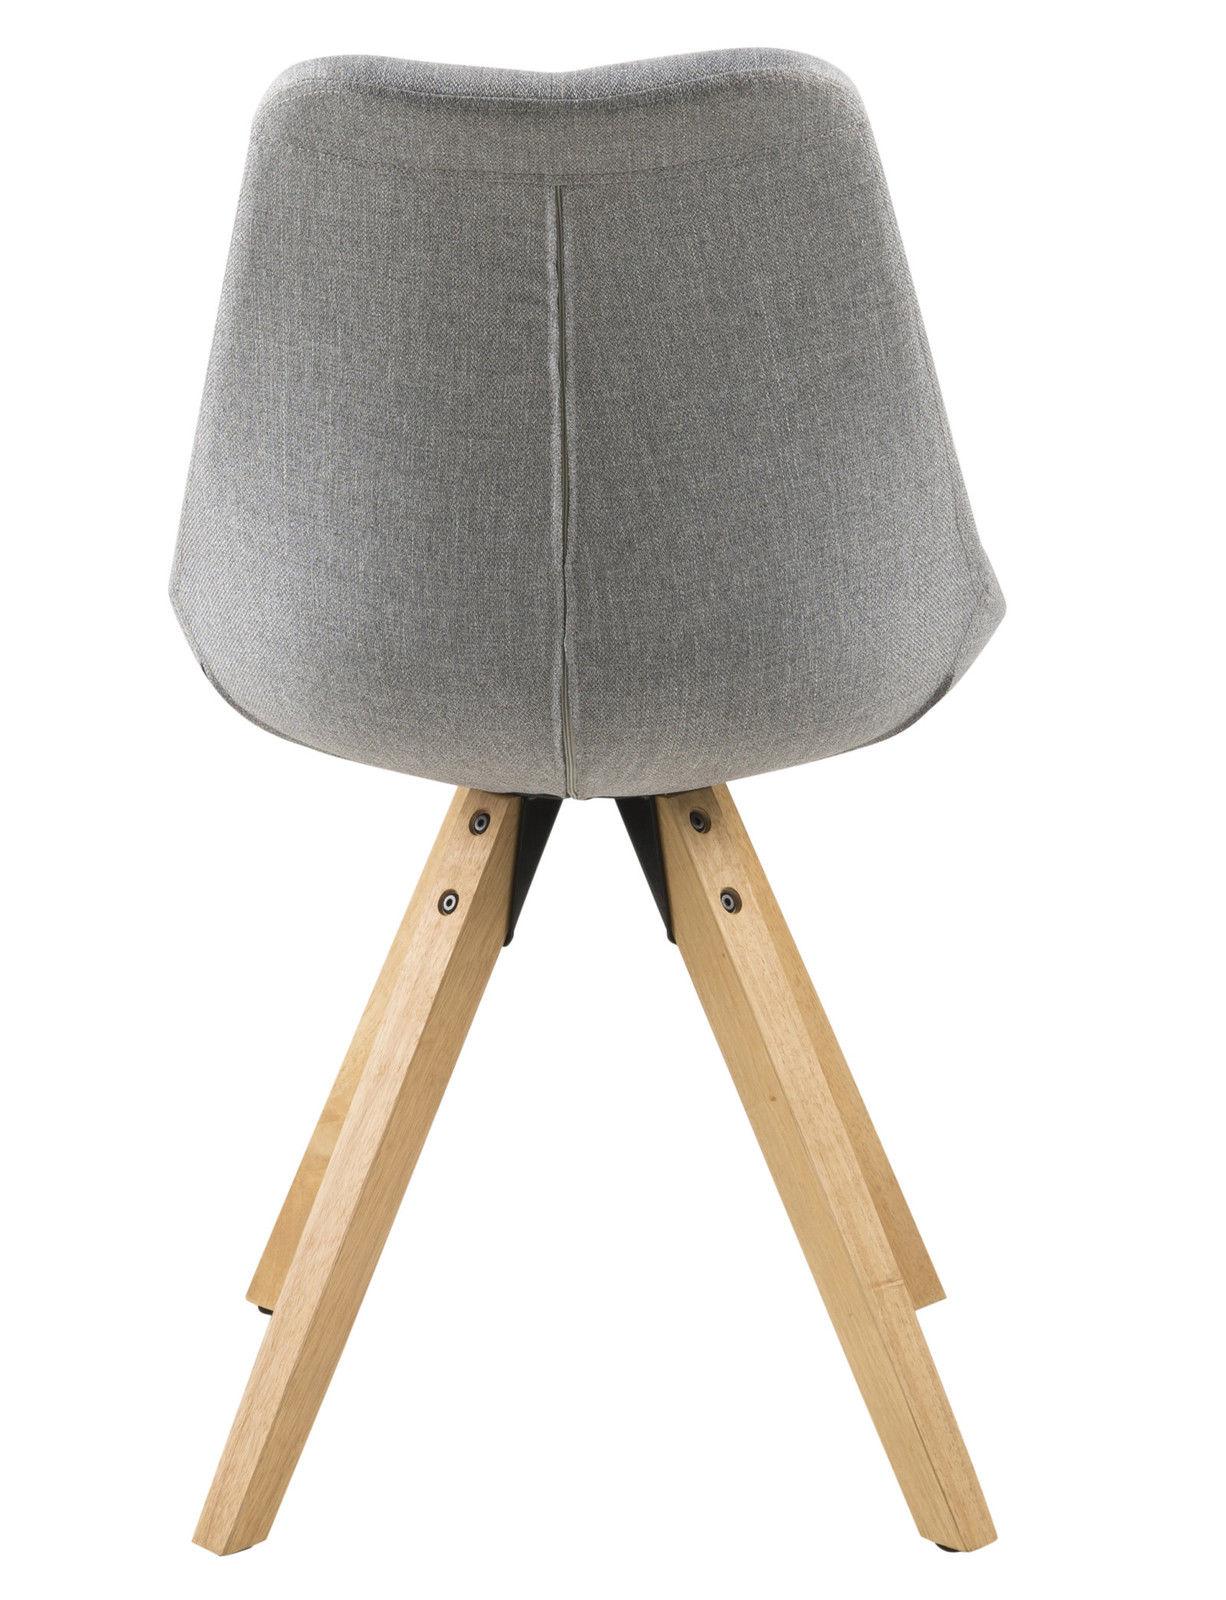 2x pkline esszimmerstuhl in grau designerstuhl esszimmer. Black Bedroom Furniture Sets. Home Design Ideas